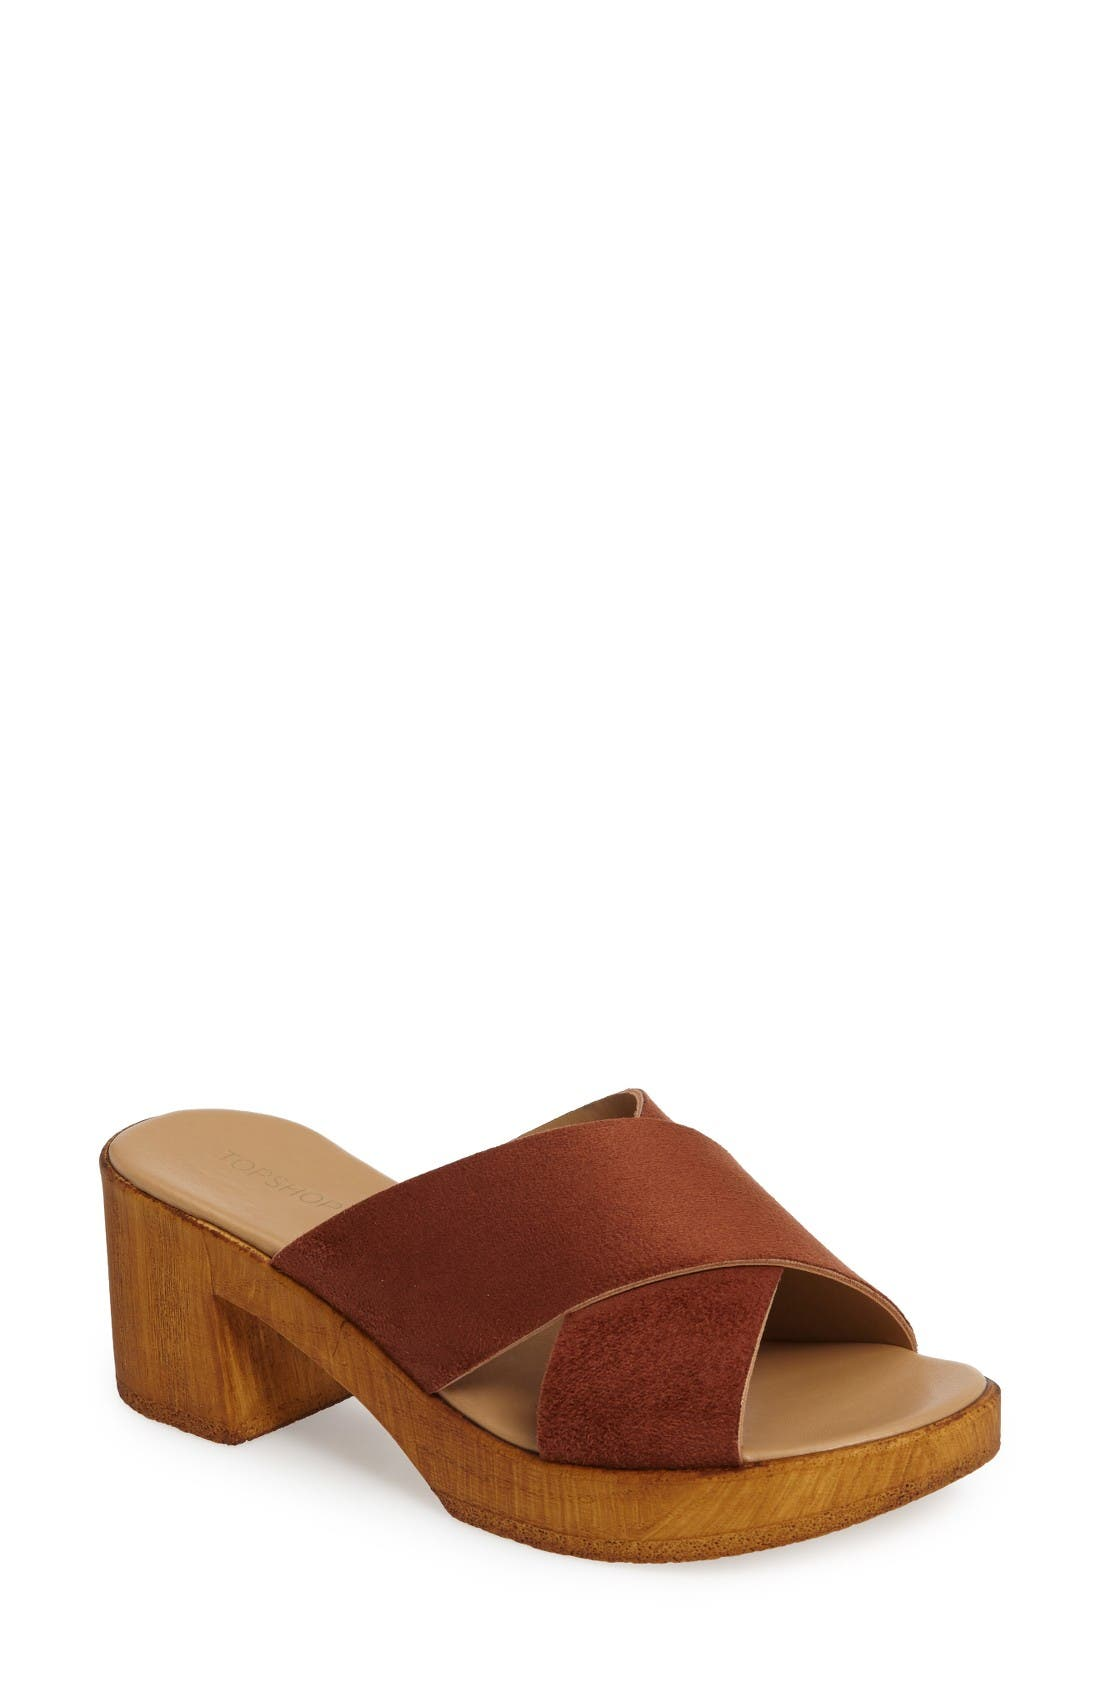 Main Image - Topshop Dixy Clog Sandal (Women)